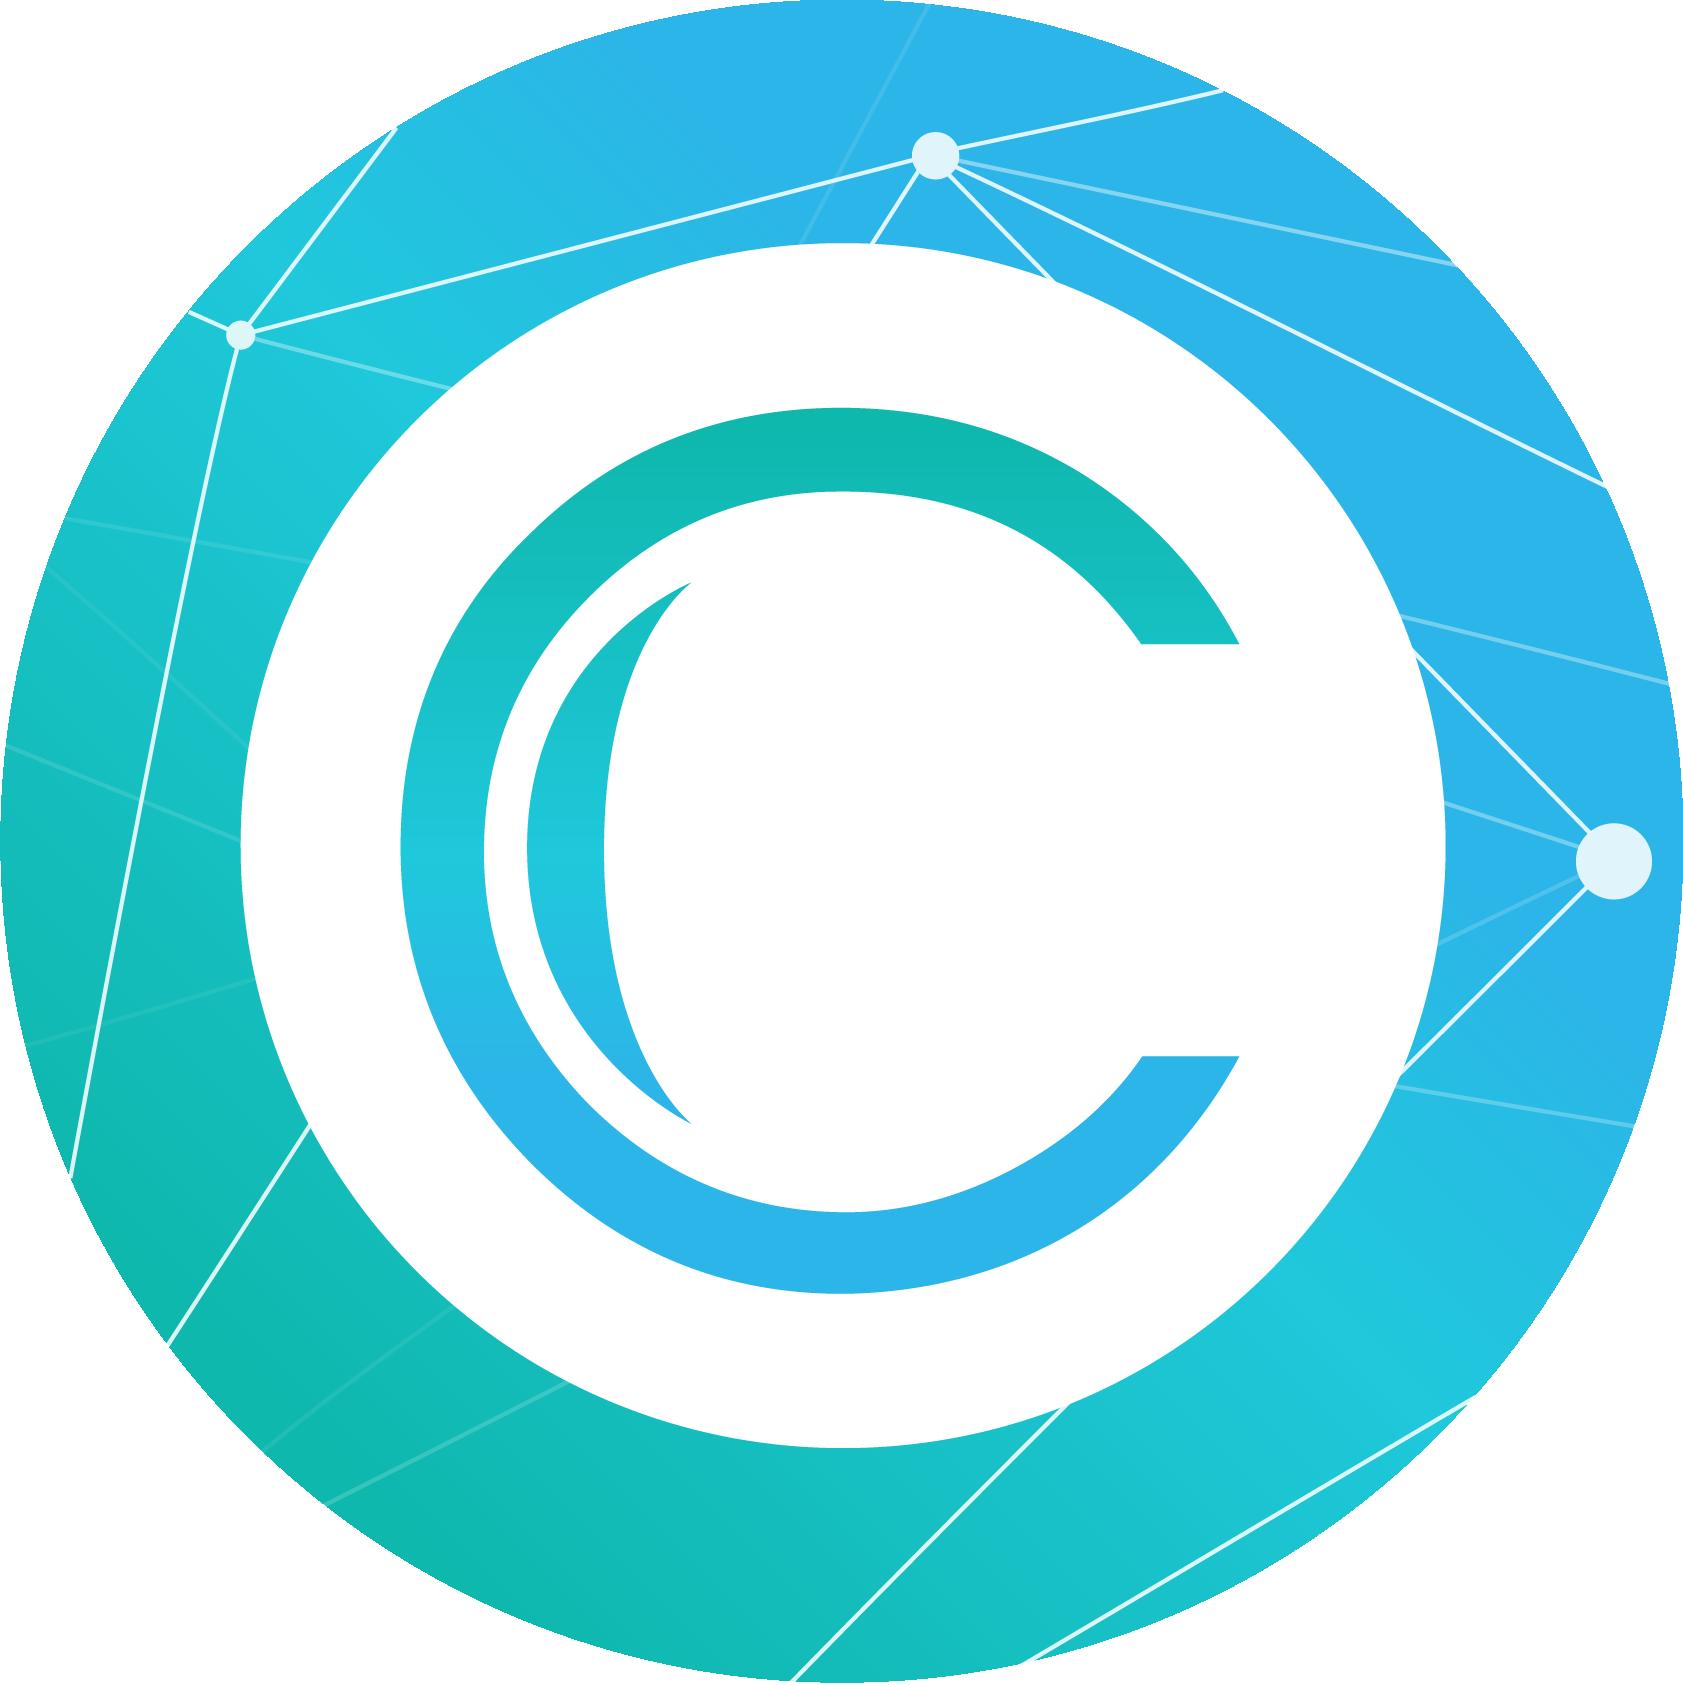 Conectate App Startup logo